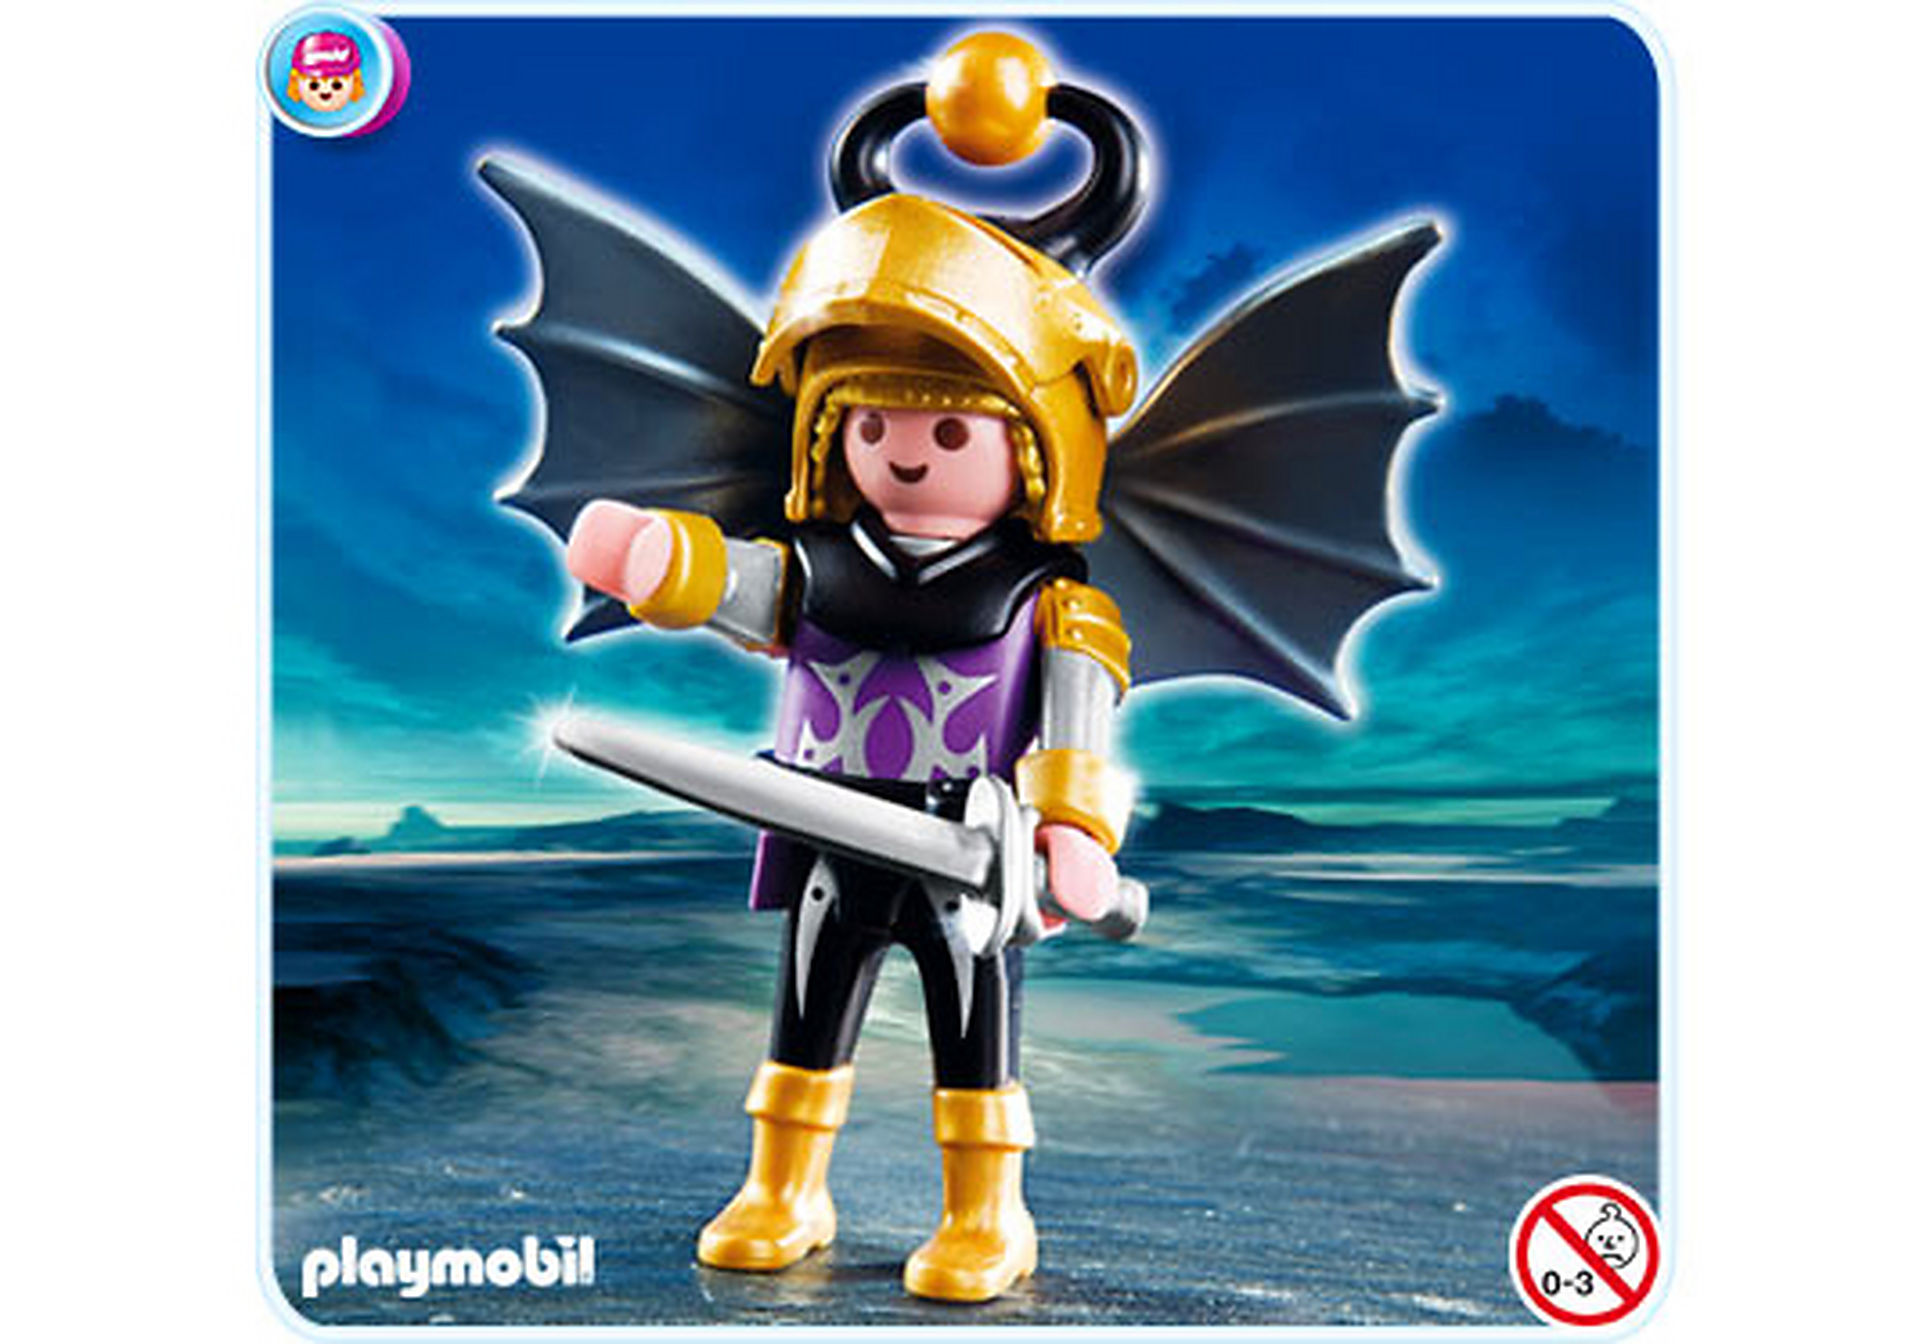 http://media.playmobil.com/i/playmobil/4696-A_product_detail/Drachenprinz